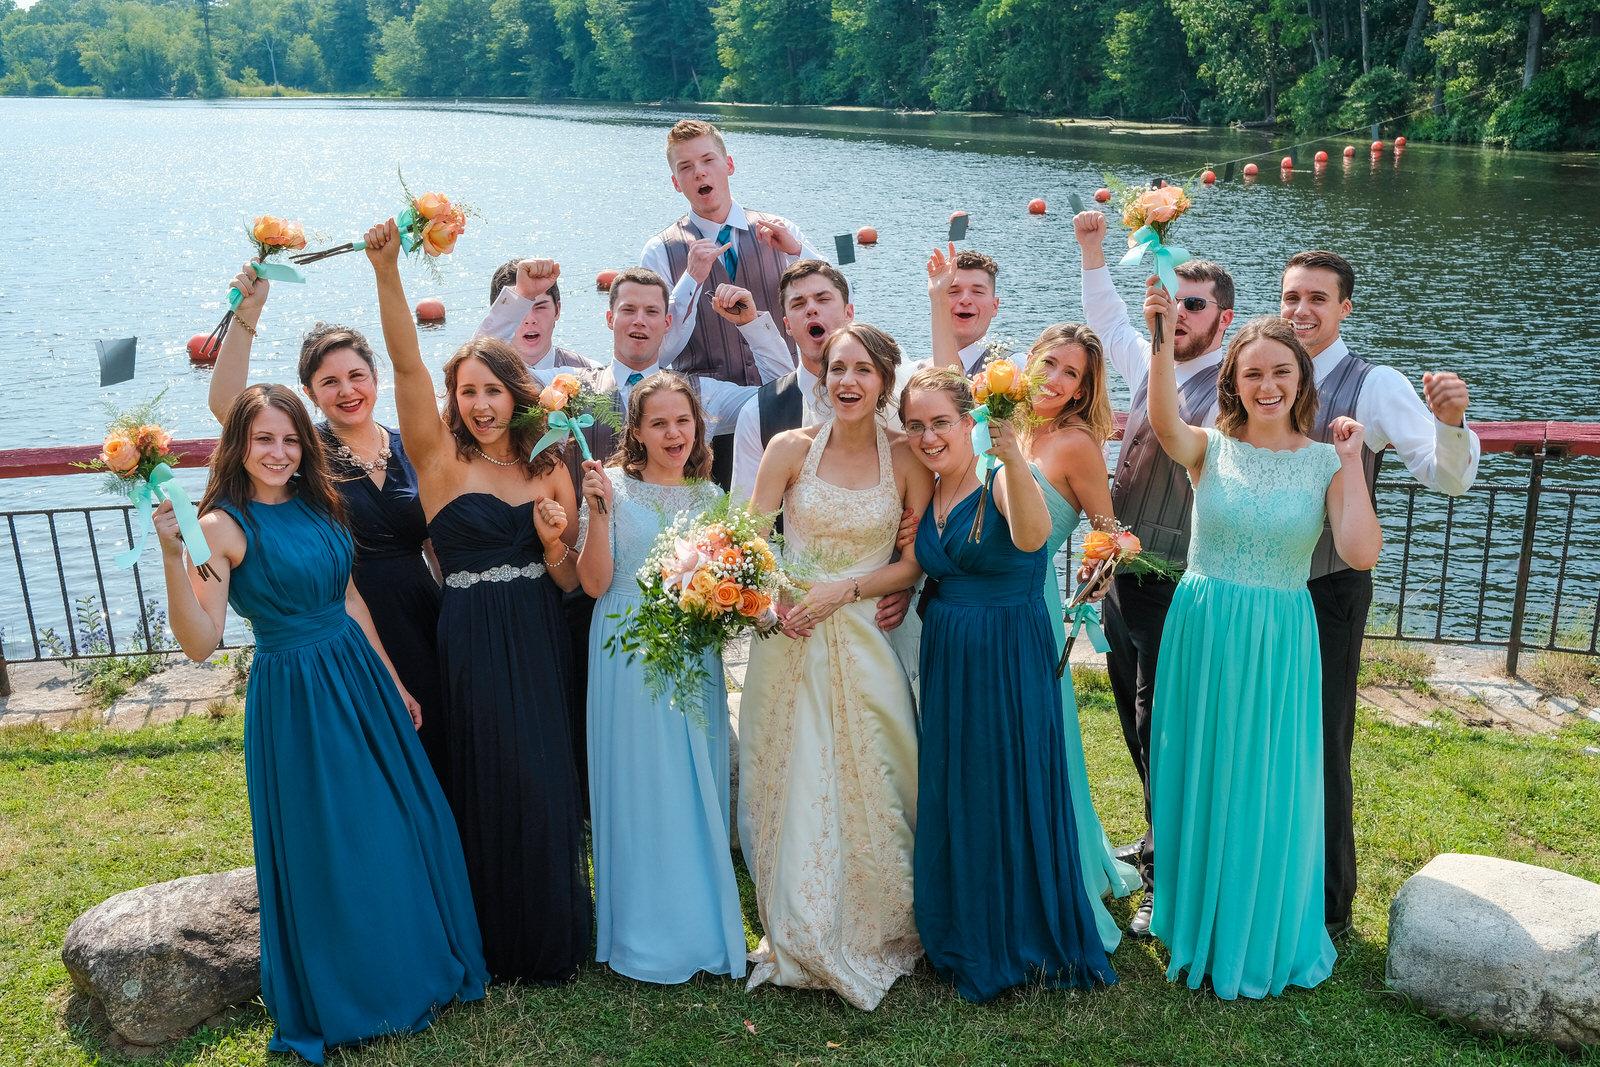 southern-nh-wedding-photography-729-1.jpg